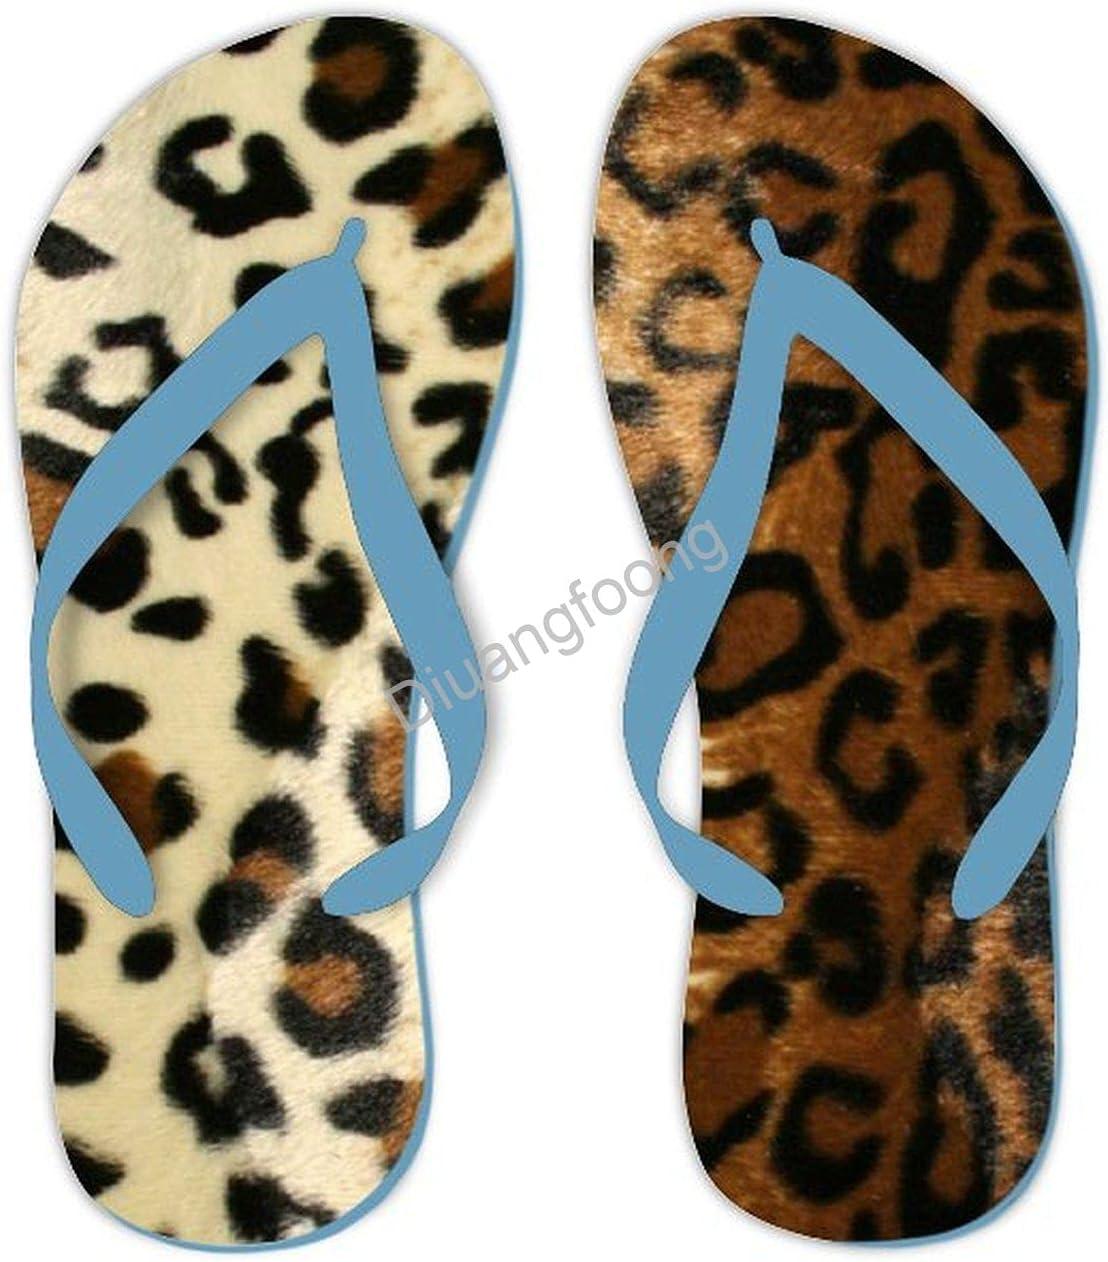 Leopard Flip Flops Comfortable Pool Thong Sandal Pretty Sandal For House Bathroom Party Blue Style8